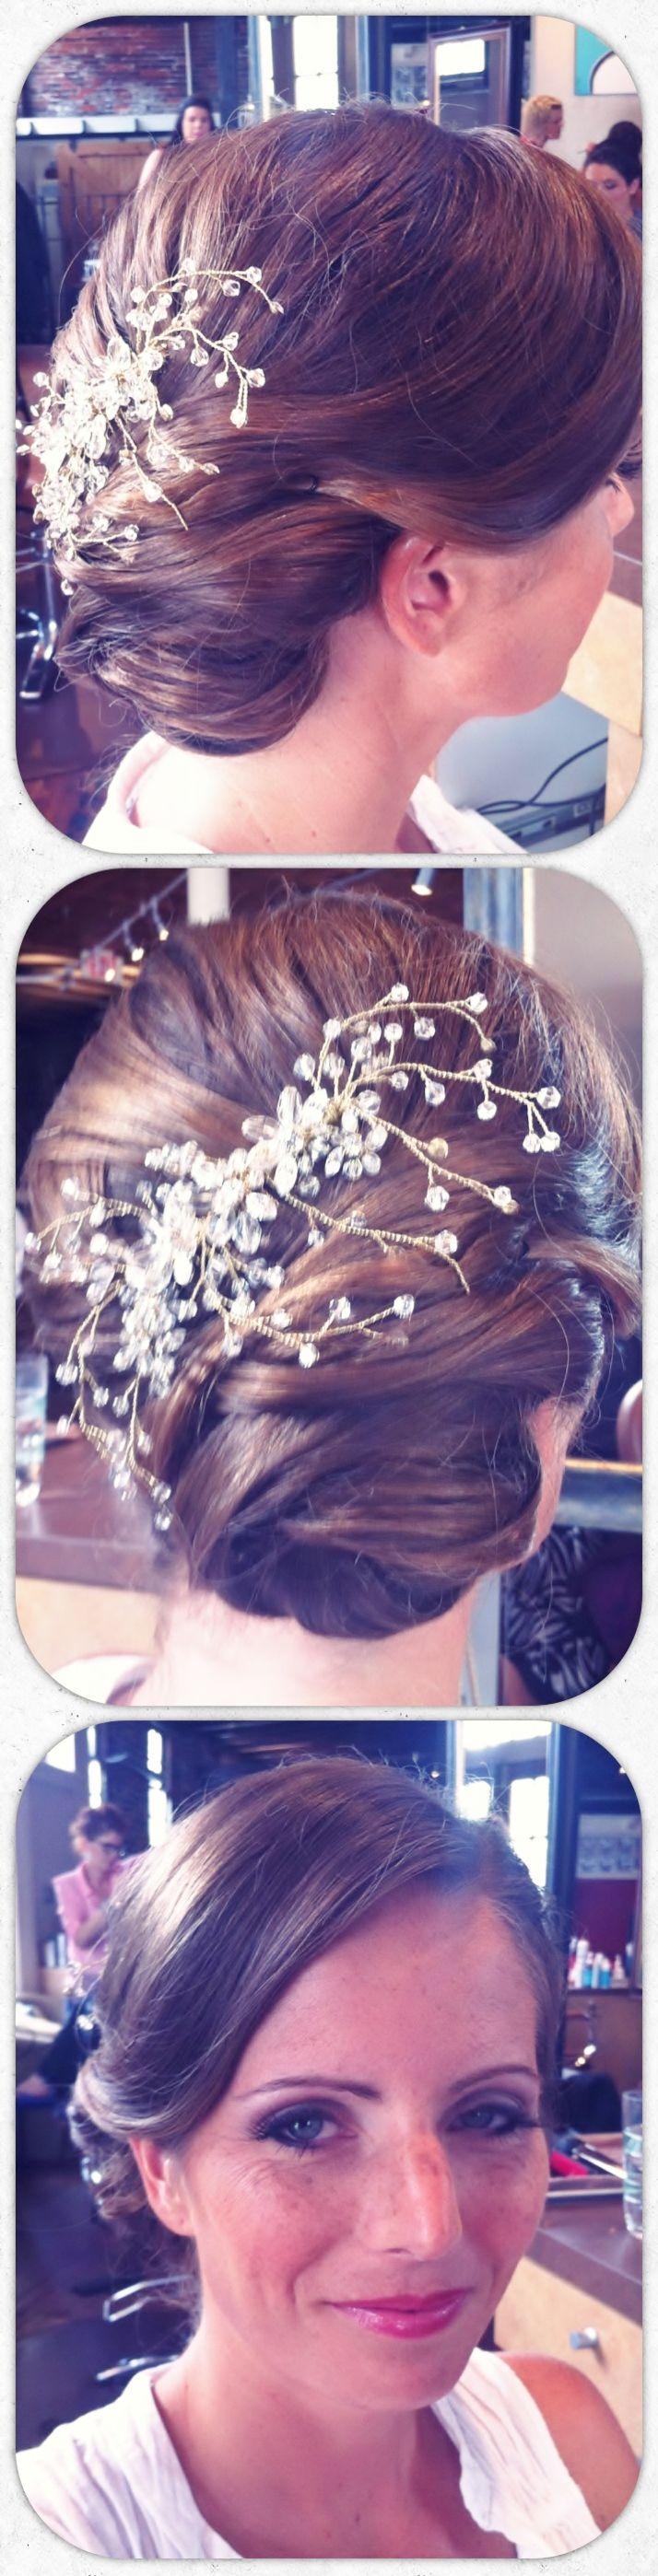 Bridal Hair by Jessica Combs - Makeup by Dana Clift of Blaze Salon #Blaze Salon #Blaze #BridalHair #Bride #Hair #Wedding #WeddingHair #Updo #UpdoArt #BridalMakeup #Makeup #make-up